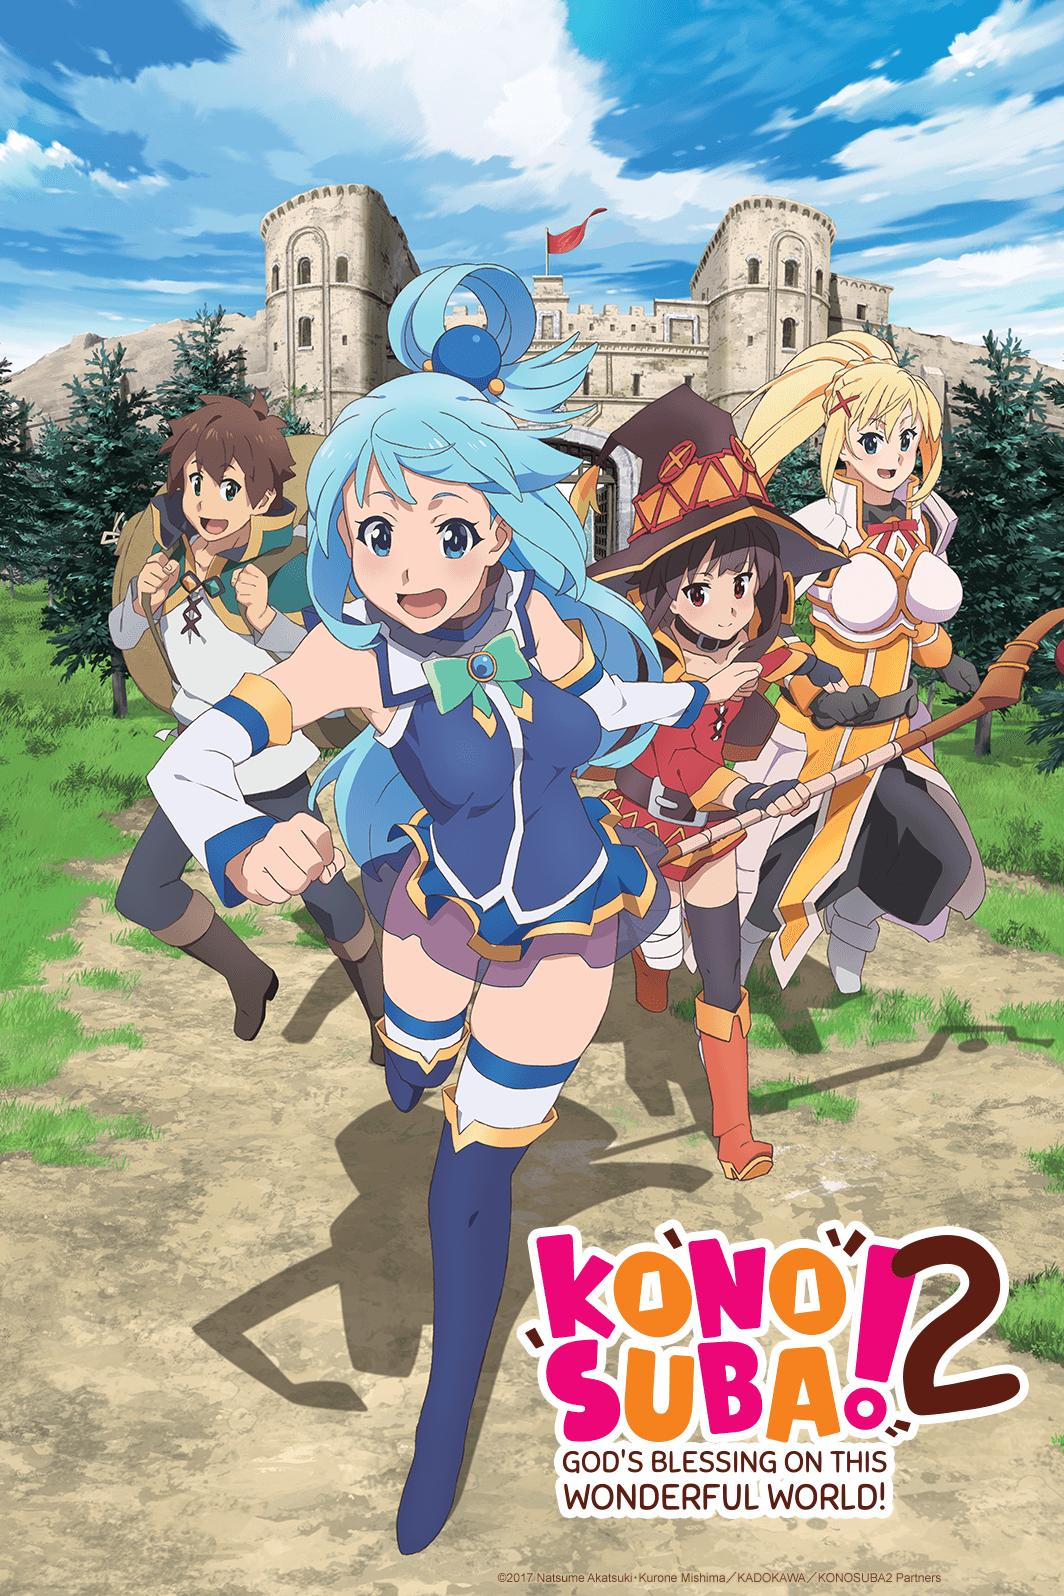 KONOSUBA -God's blessing on this wonderful world! - Watch on